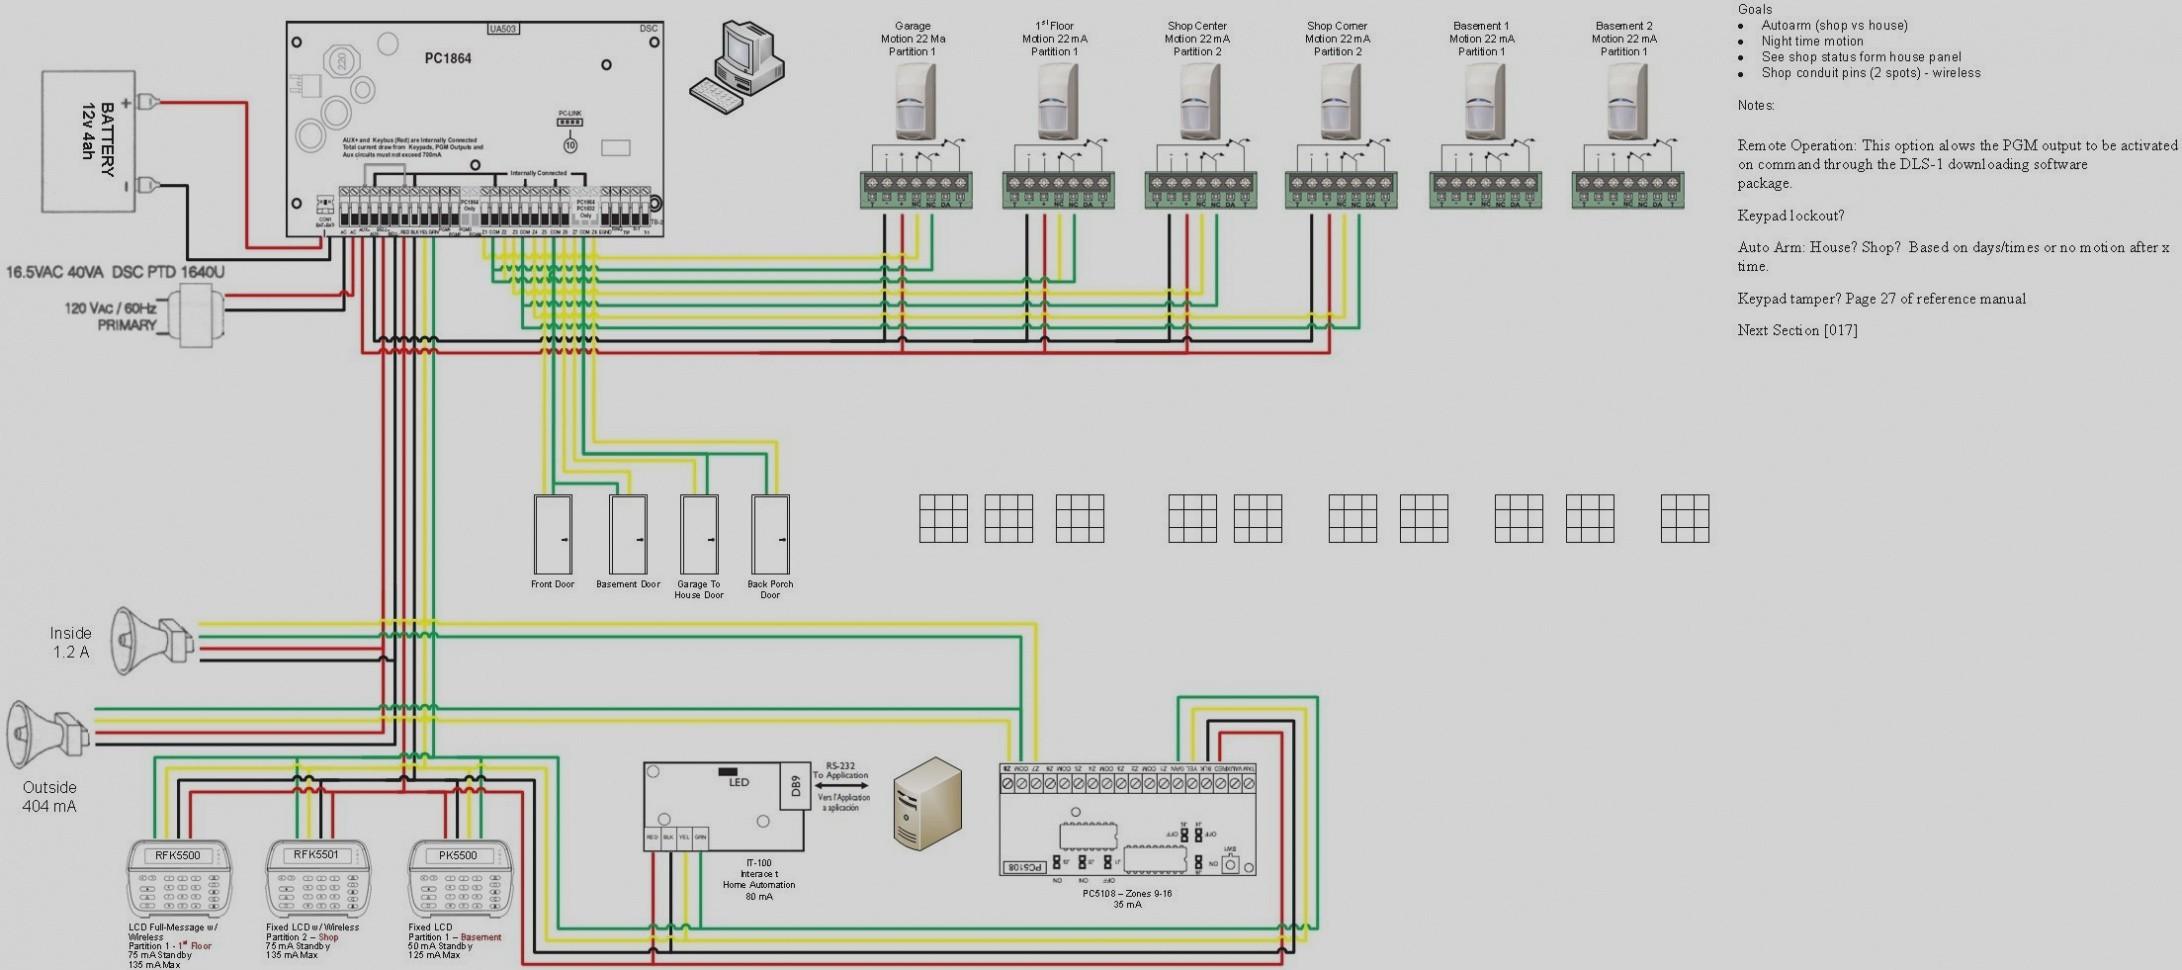 Car Alarm Circuit Diagram Wiring Diagram for Home Alarm System Save Alarm System Wiring Of Car Alarm Circuit Diagram